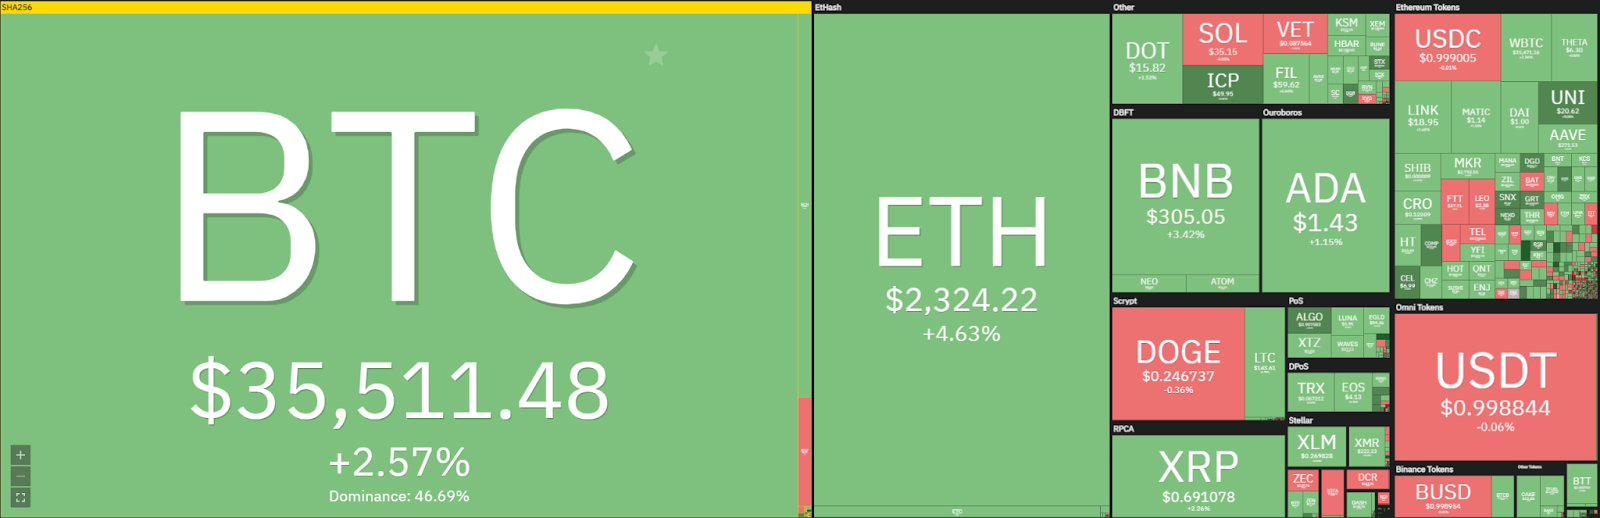 Polkadot price analysis: DOT sets a higher low, ready to push to $19 next? 1